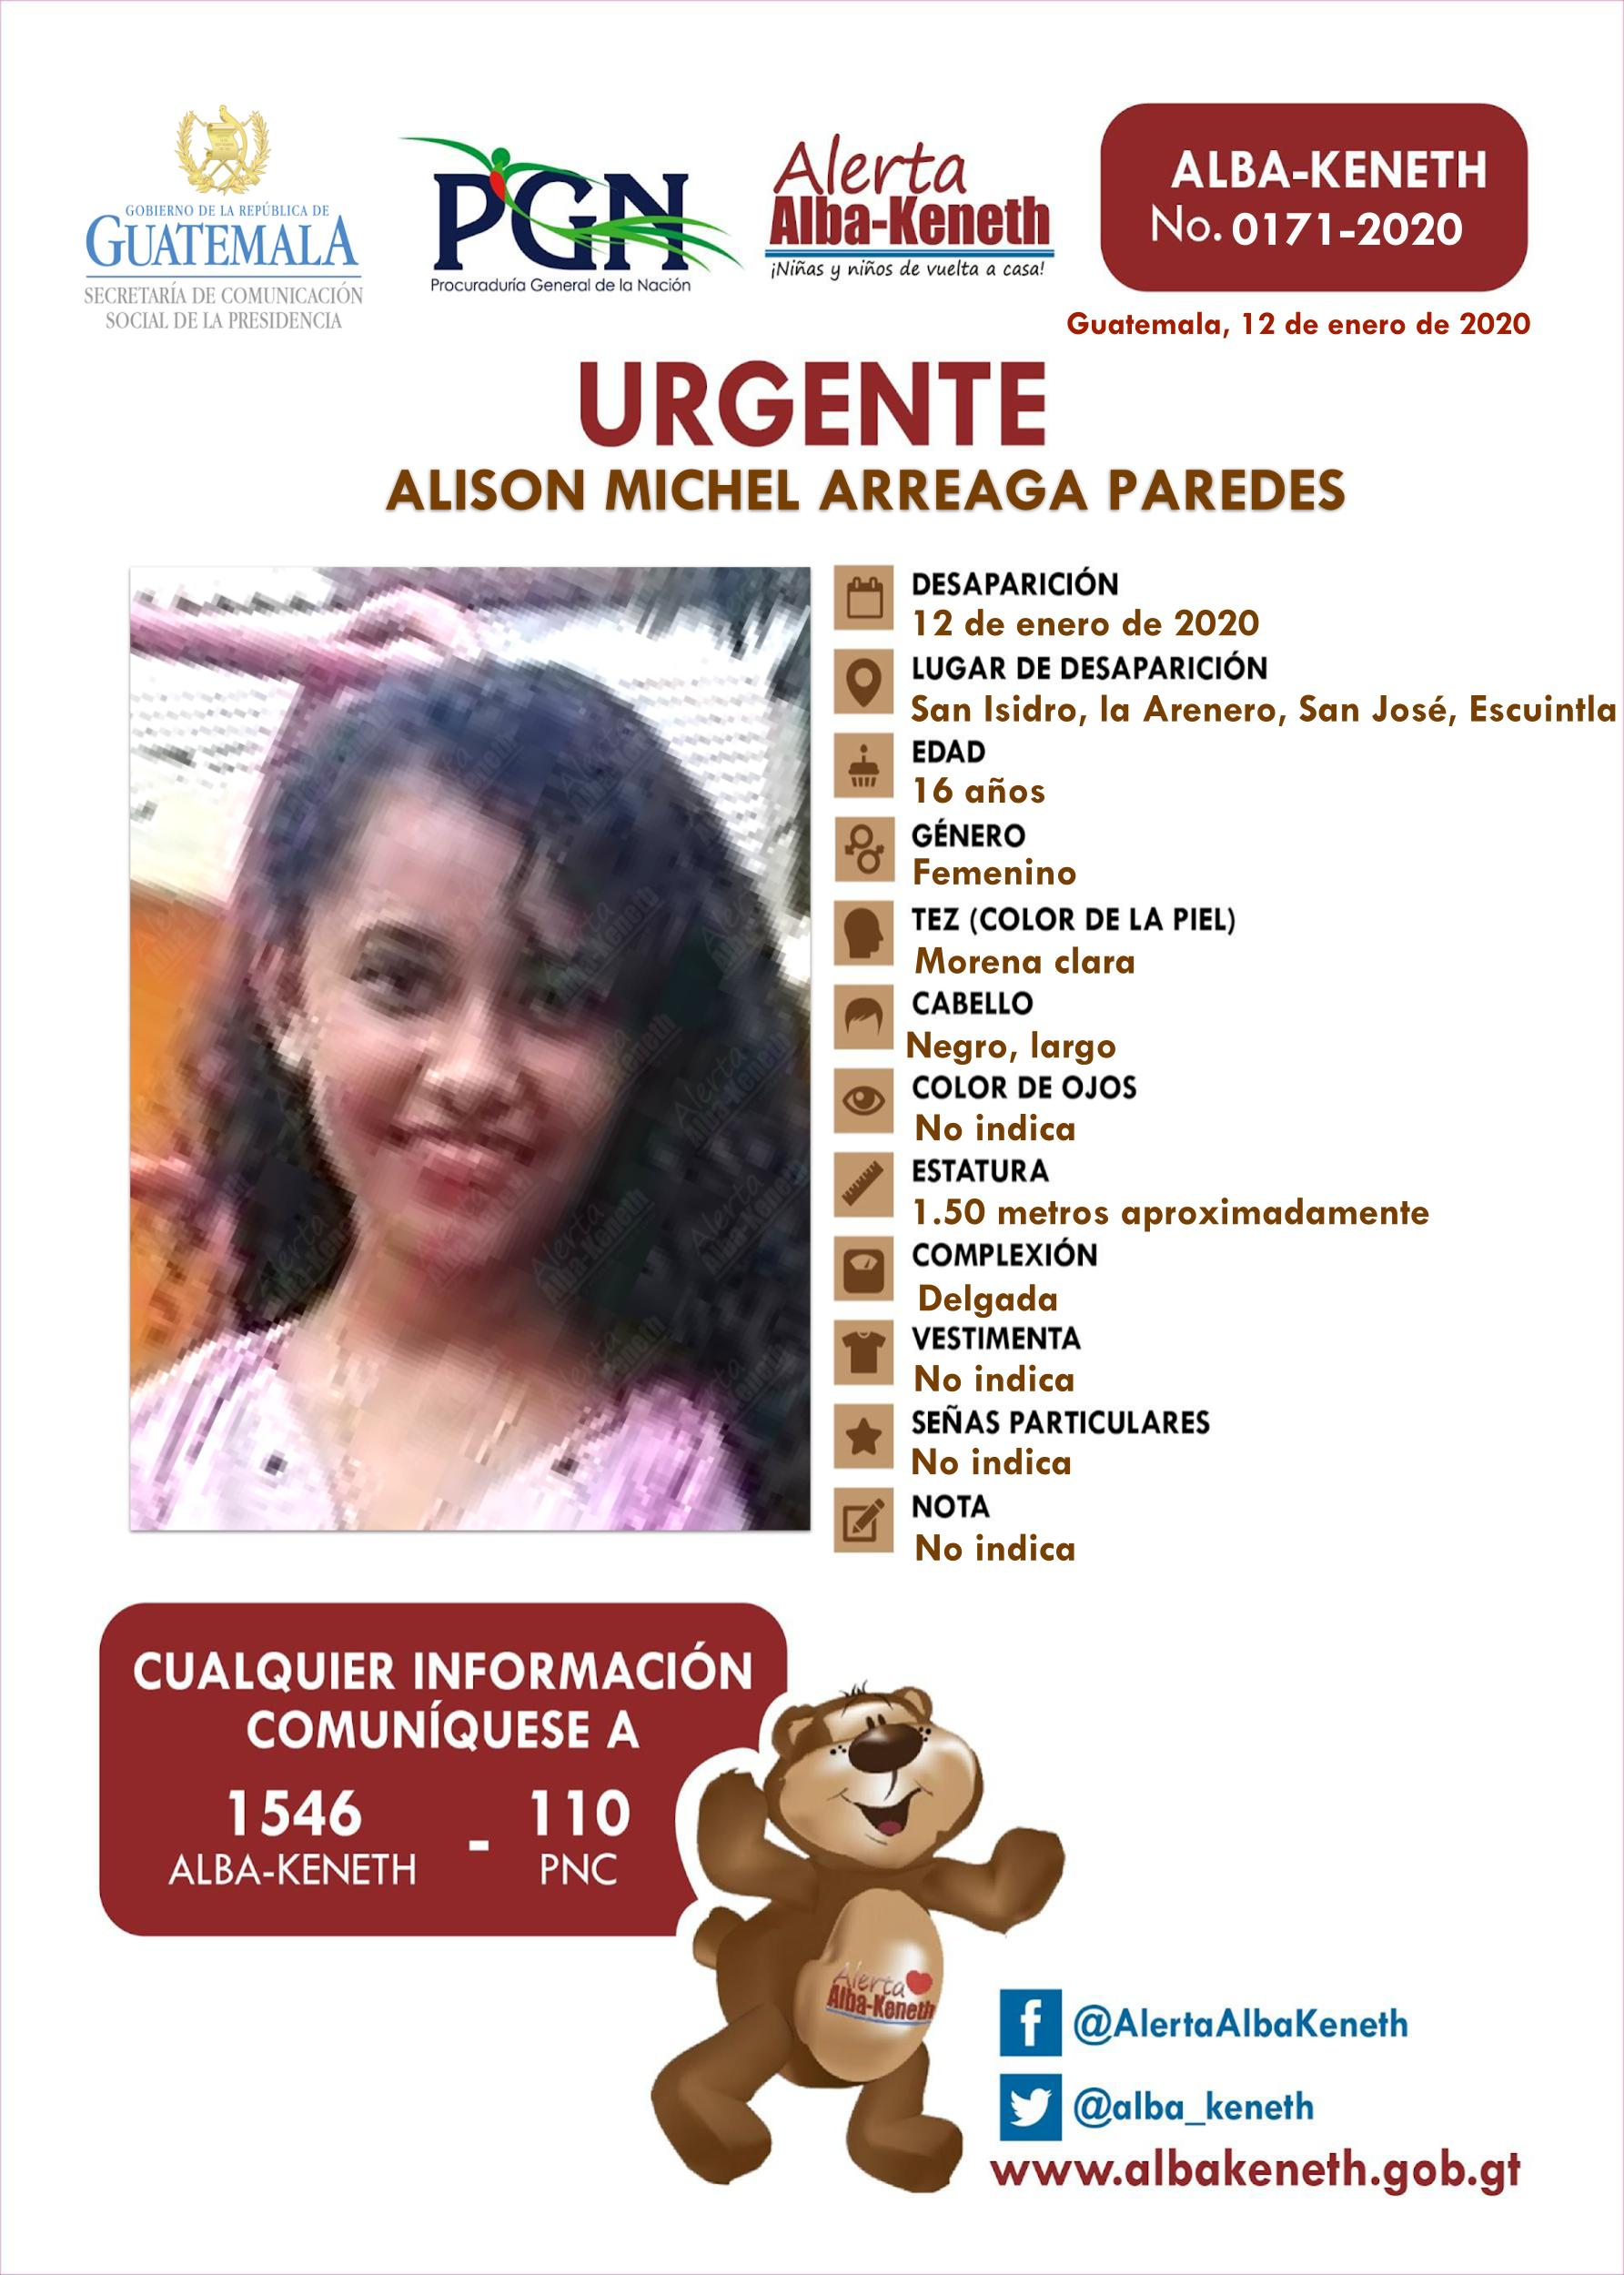 Alison Michel Arreaga Paredes